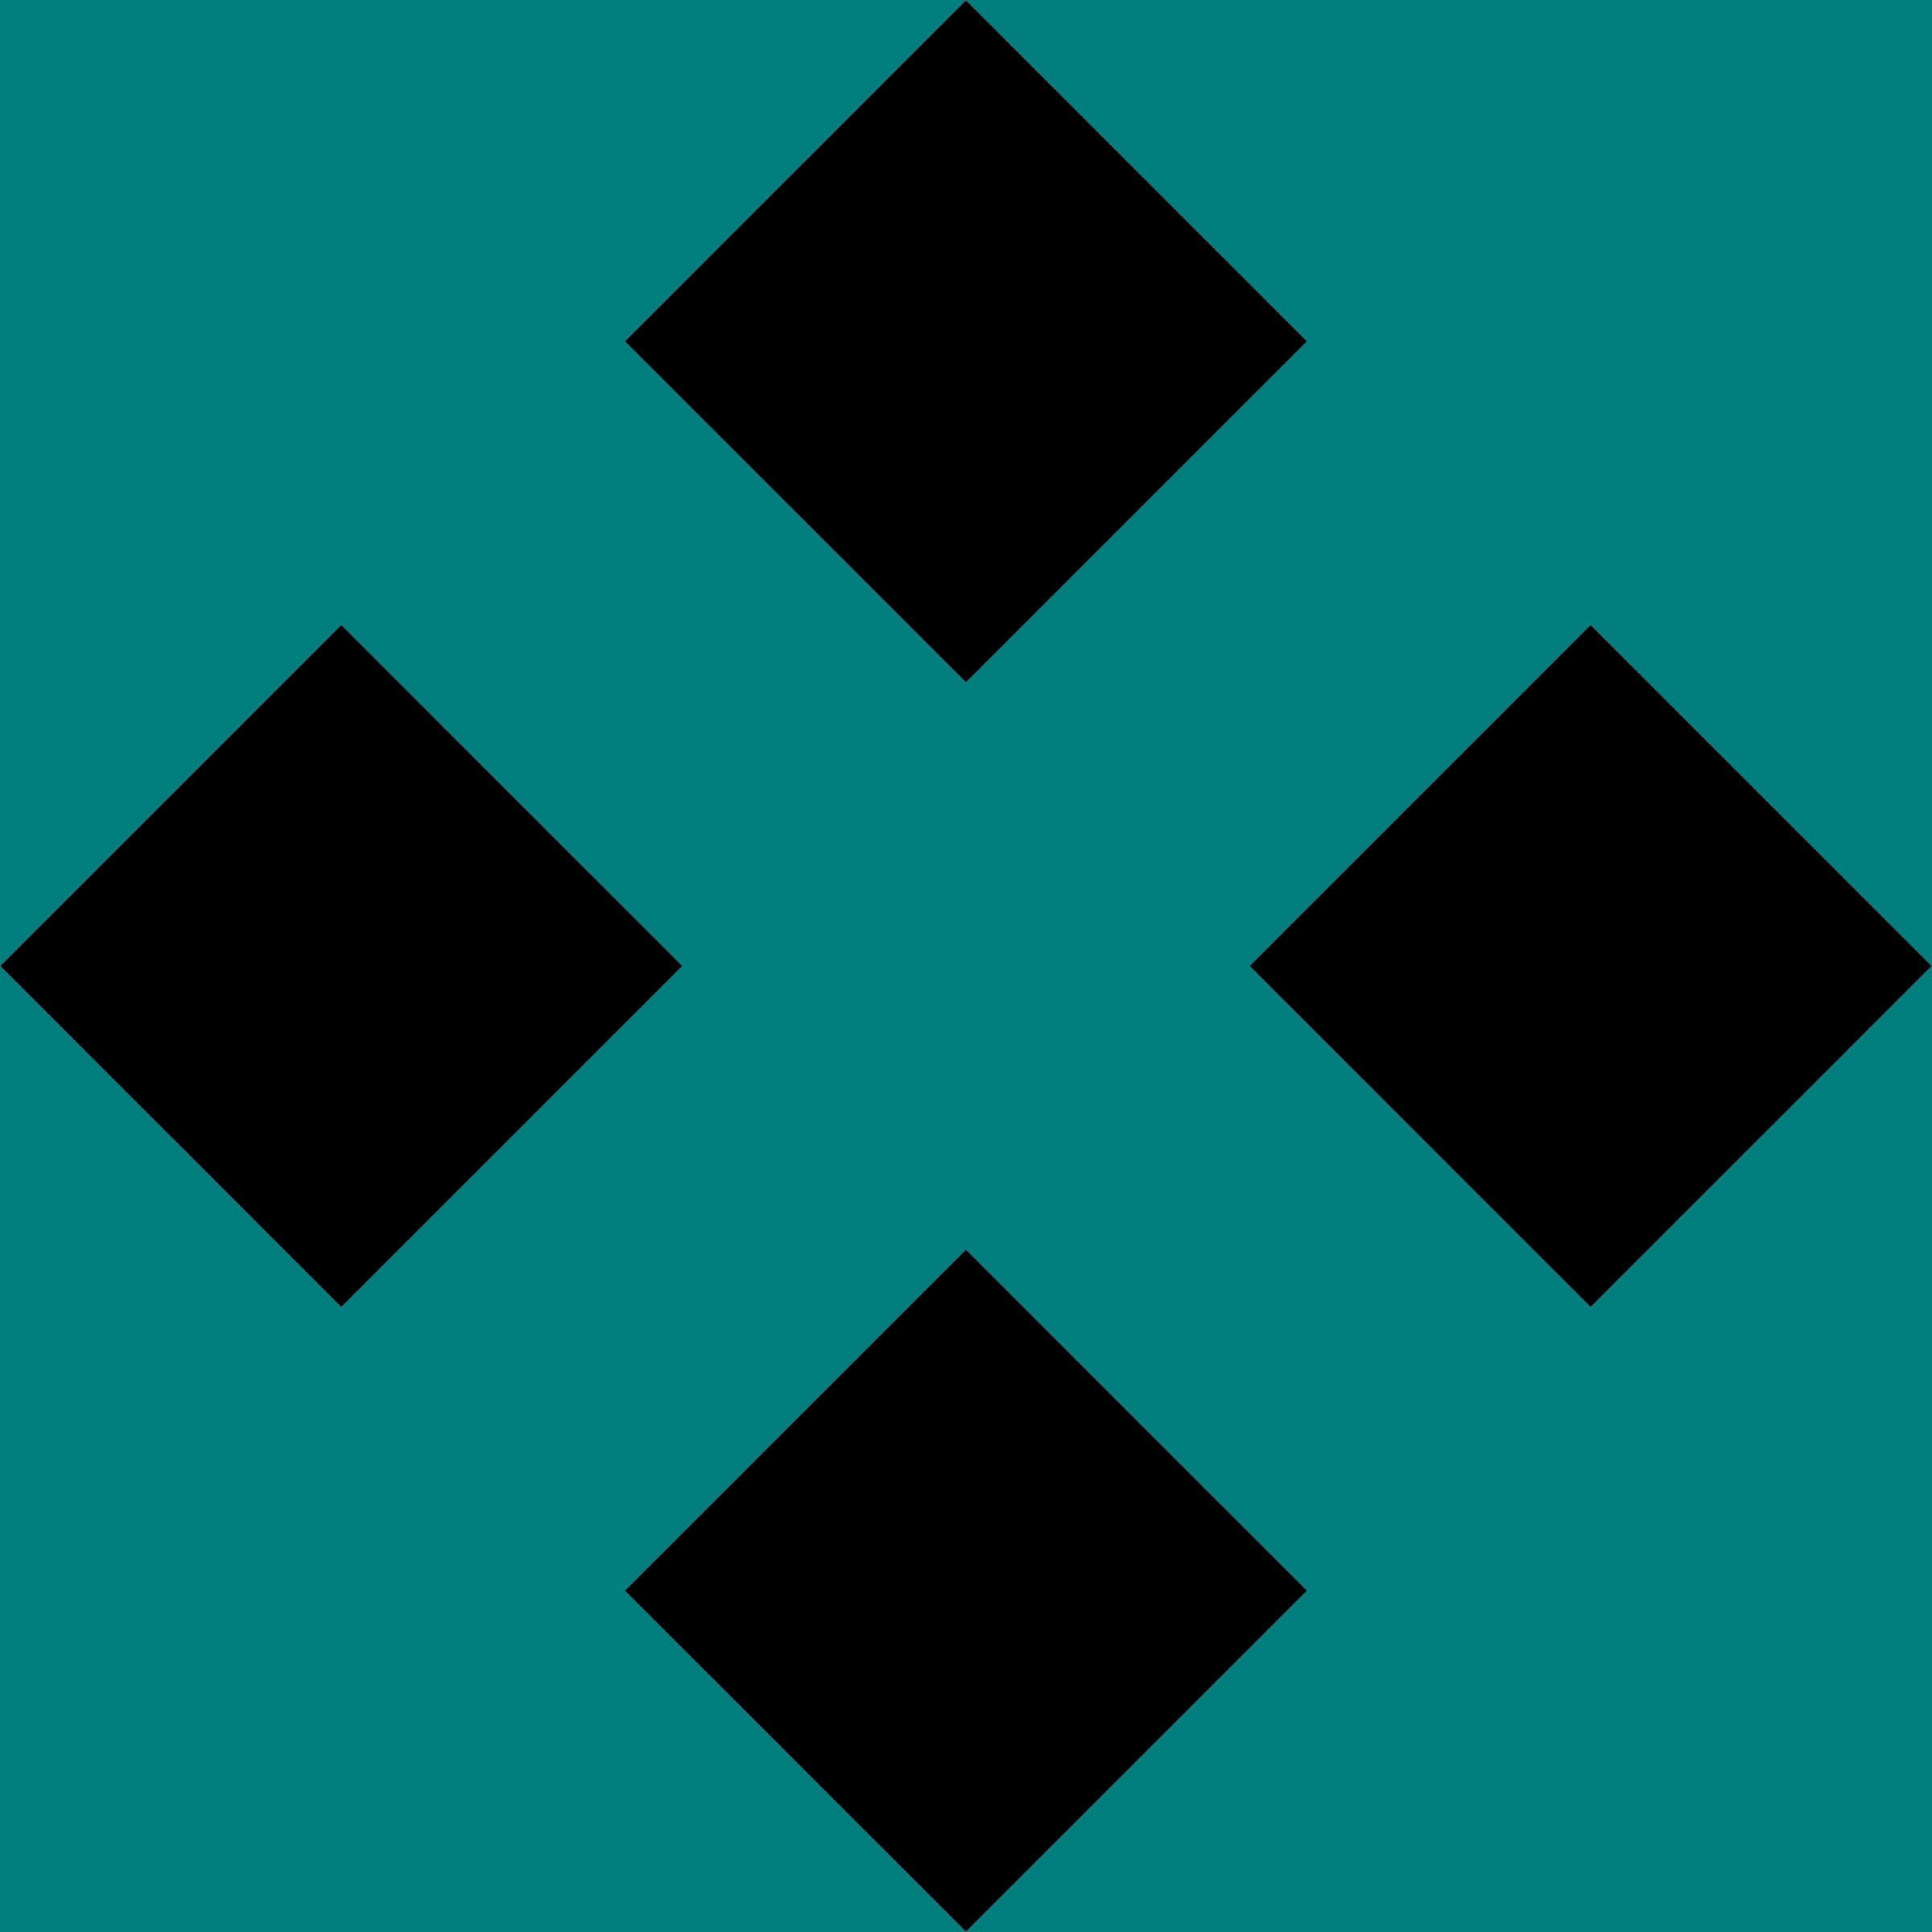 Teal cross clipart image transparent download Clipart - Cross in Squares image transparent download